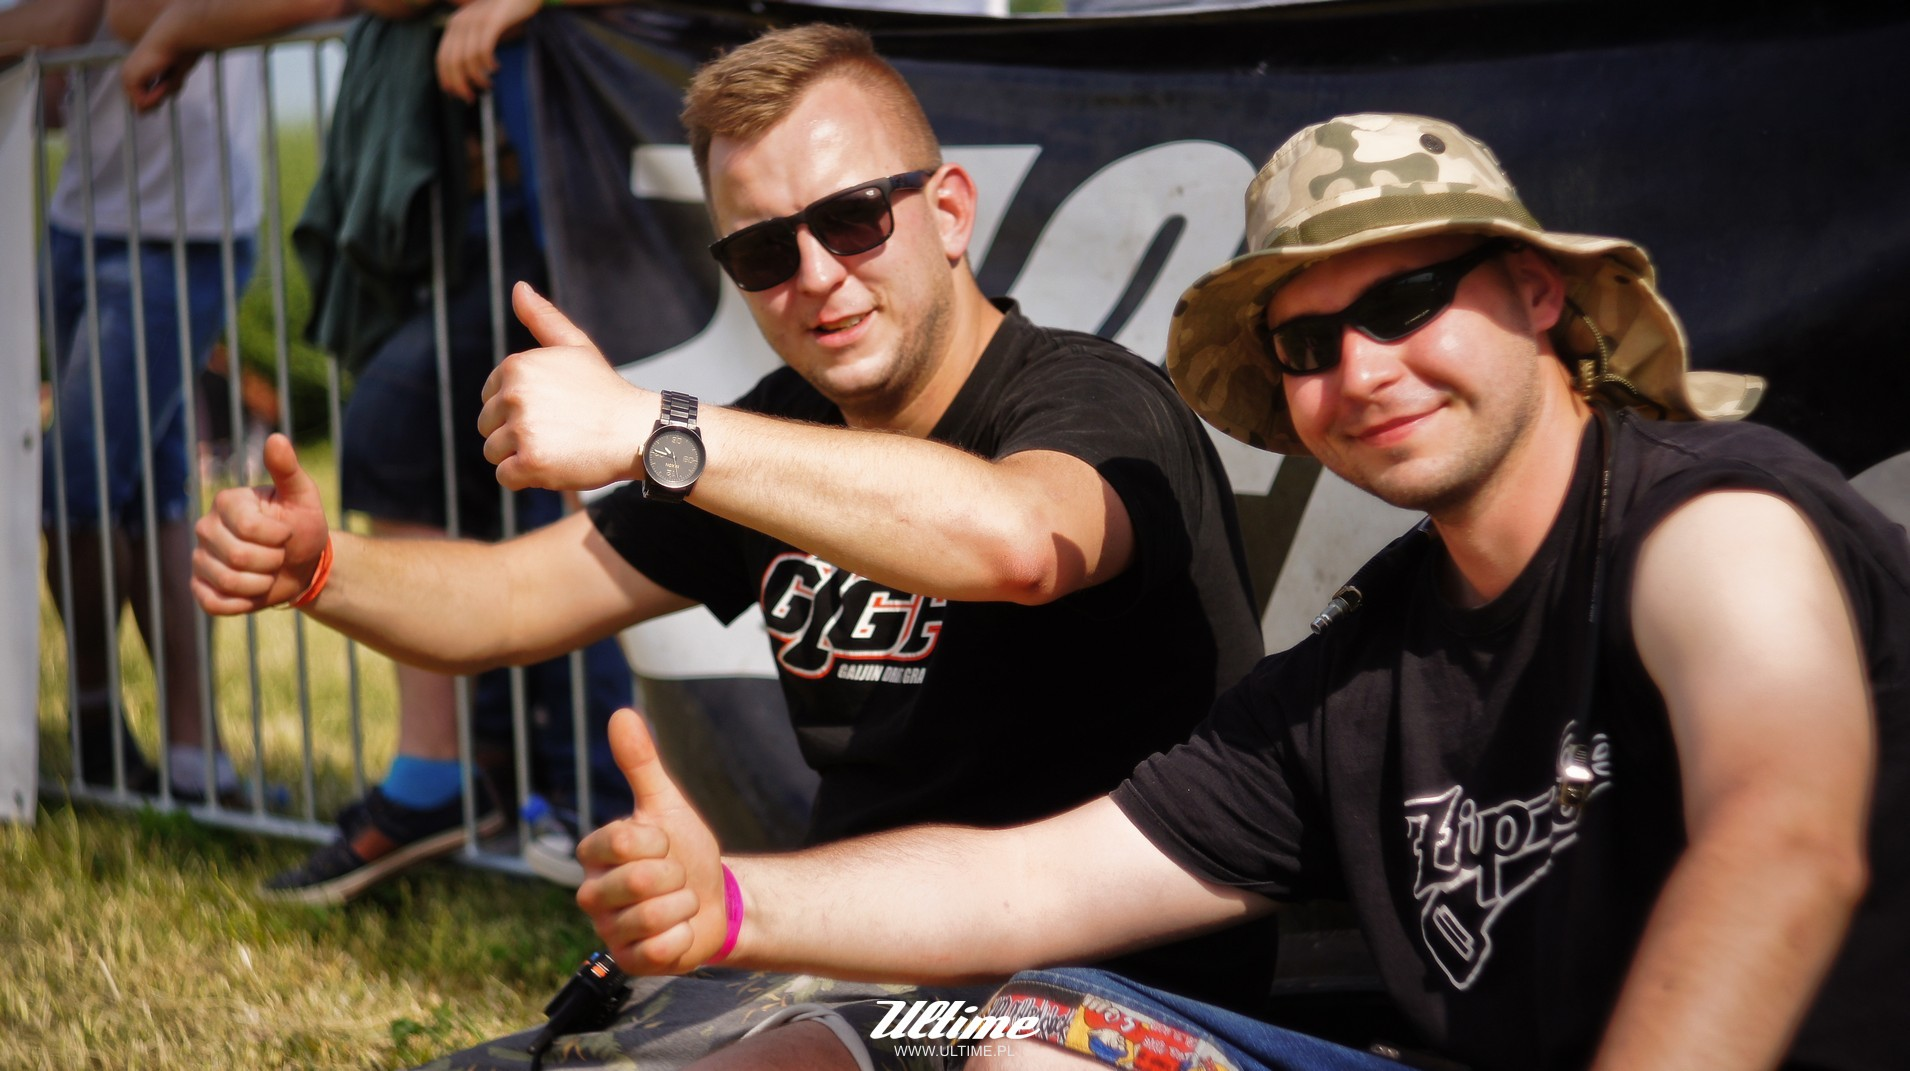 d1krk drift team ally